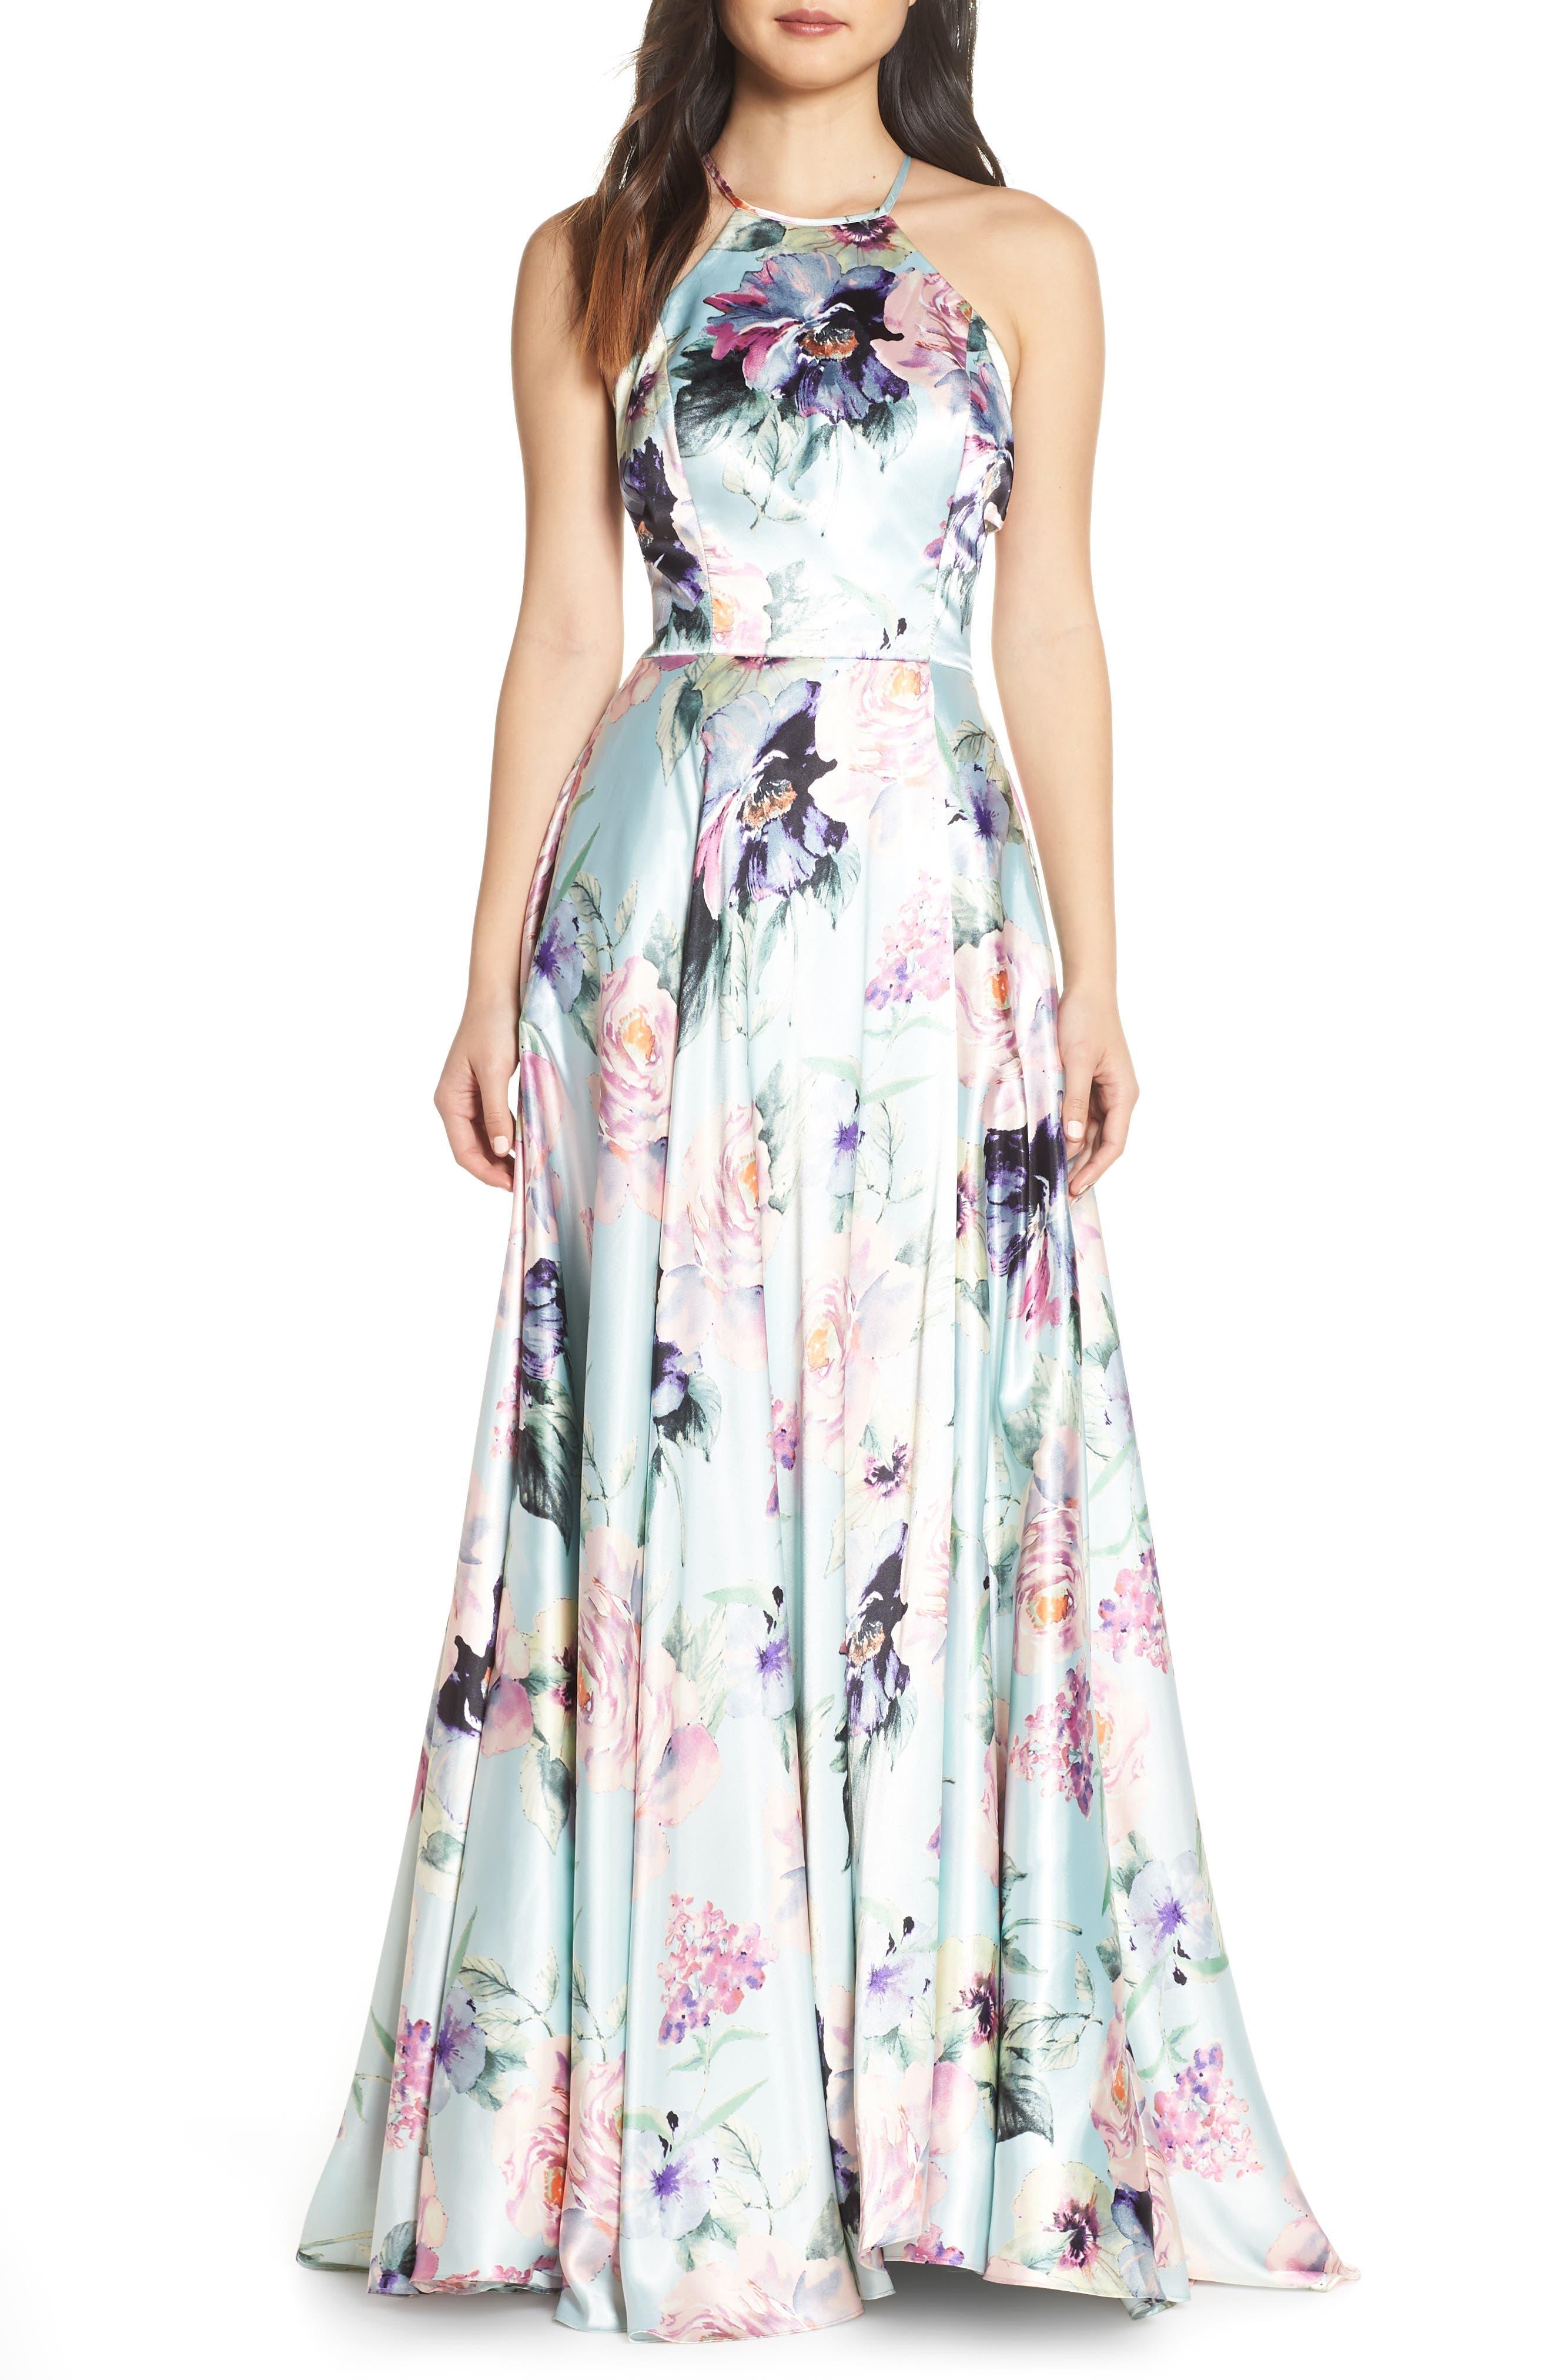 BLONDIE NITES Floral Print Charmeuse Evening Dress, Main, color, MINT/ MULTI